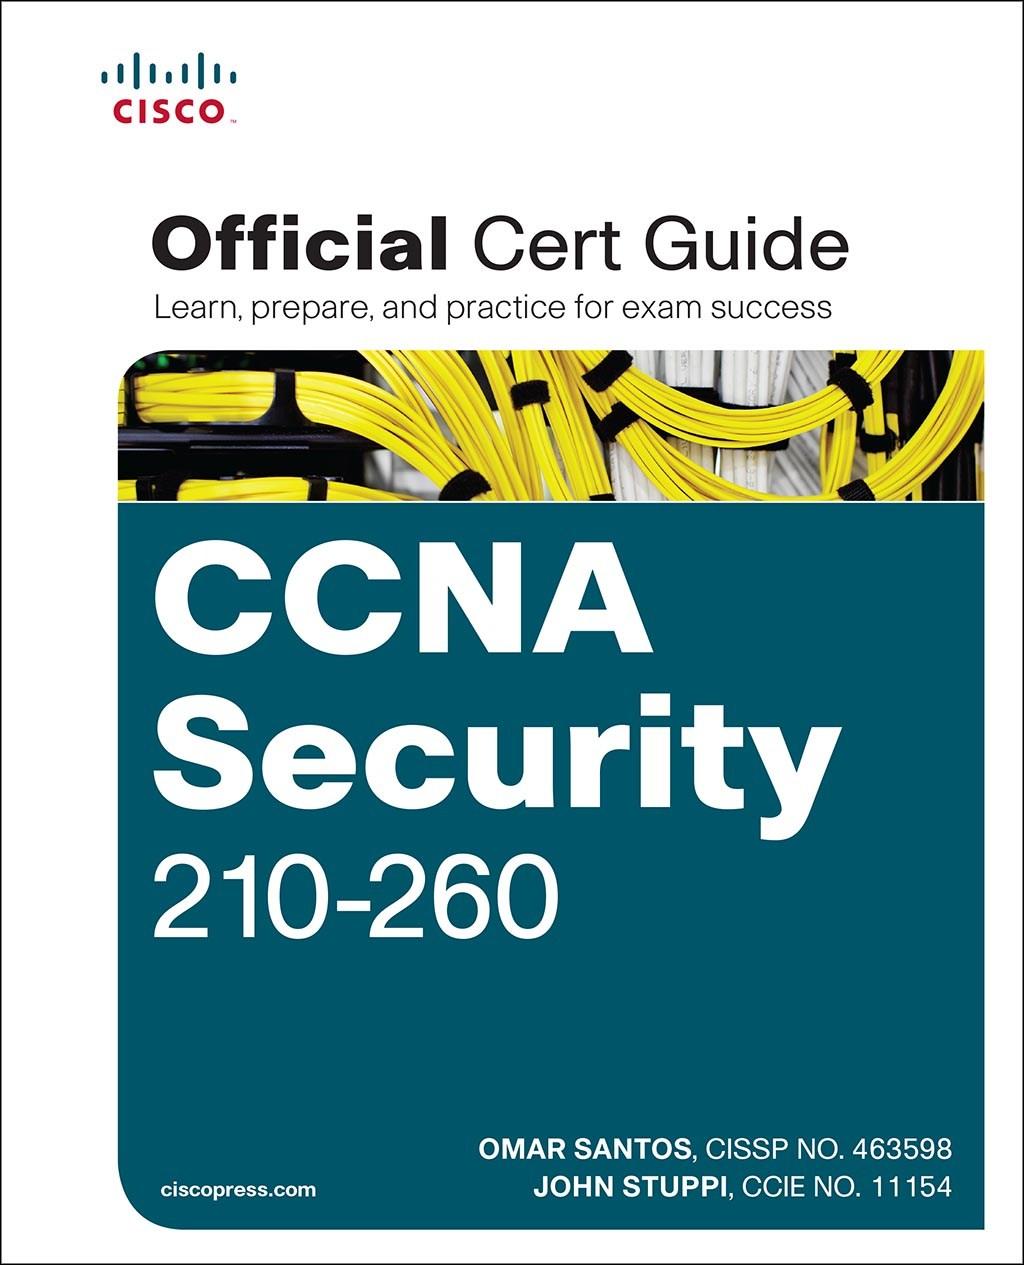 31 days before your ccna security exam rh ptgmedia pearsoncmg com